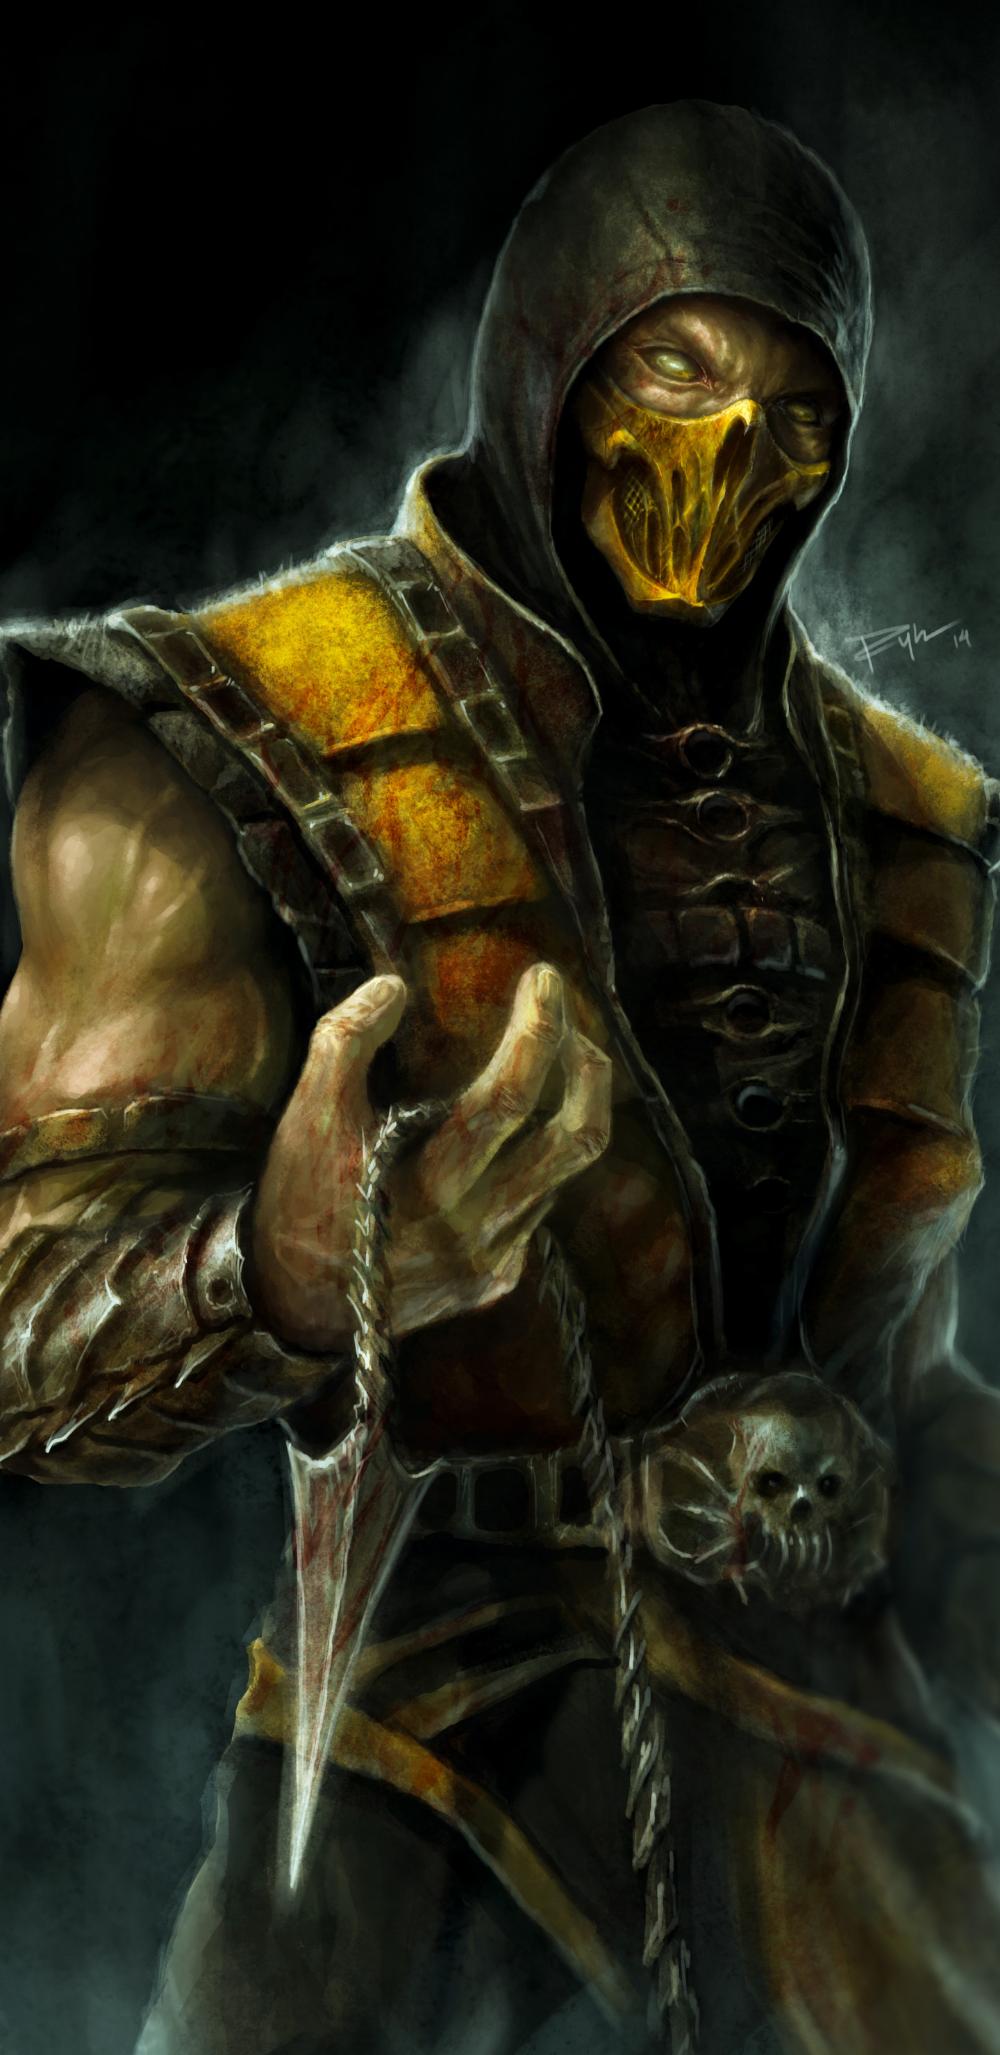 Dc Comics Personajes Mortal Kombat Personajes De Mortal Kombat Scorpion Mortal Kombat In 2020 Scorpion Mortal Kombat Mortal Kombat X Scorpion Mortal Kombat Art